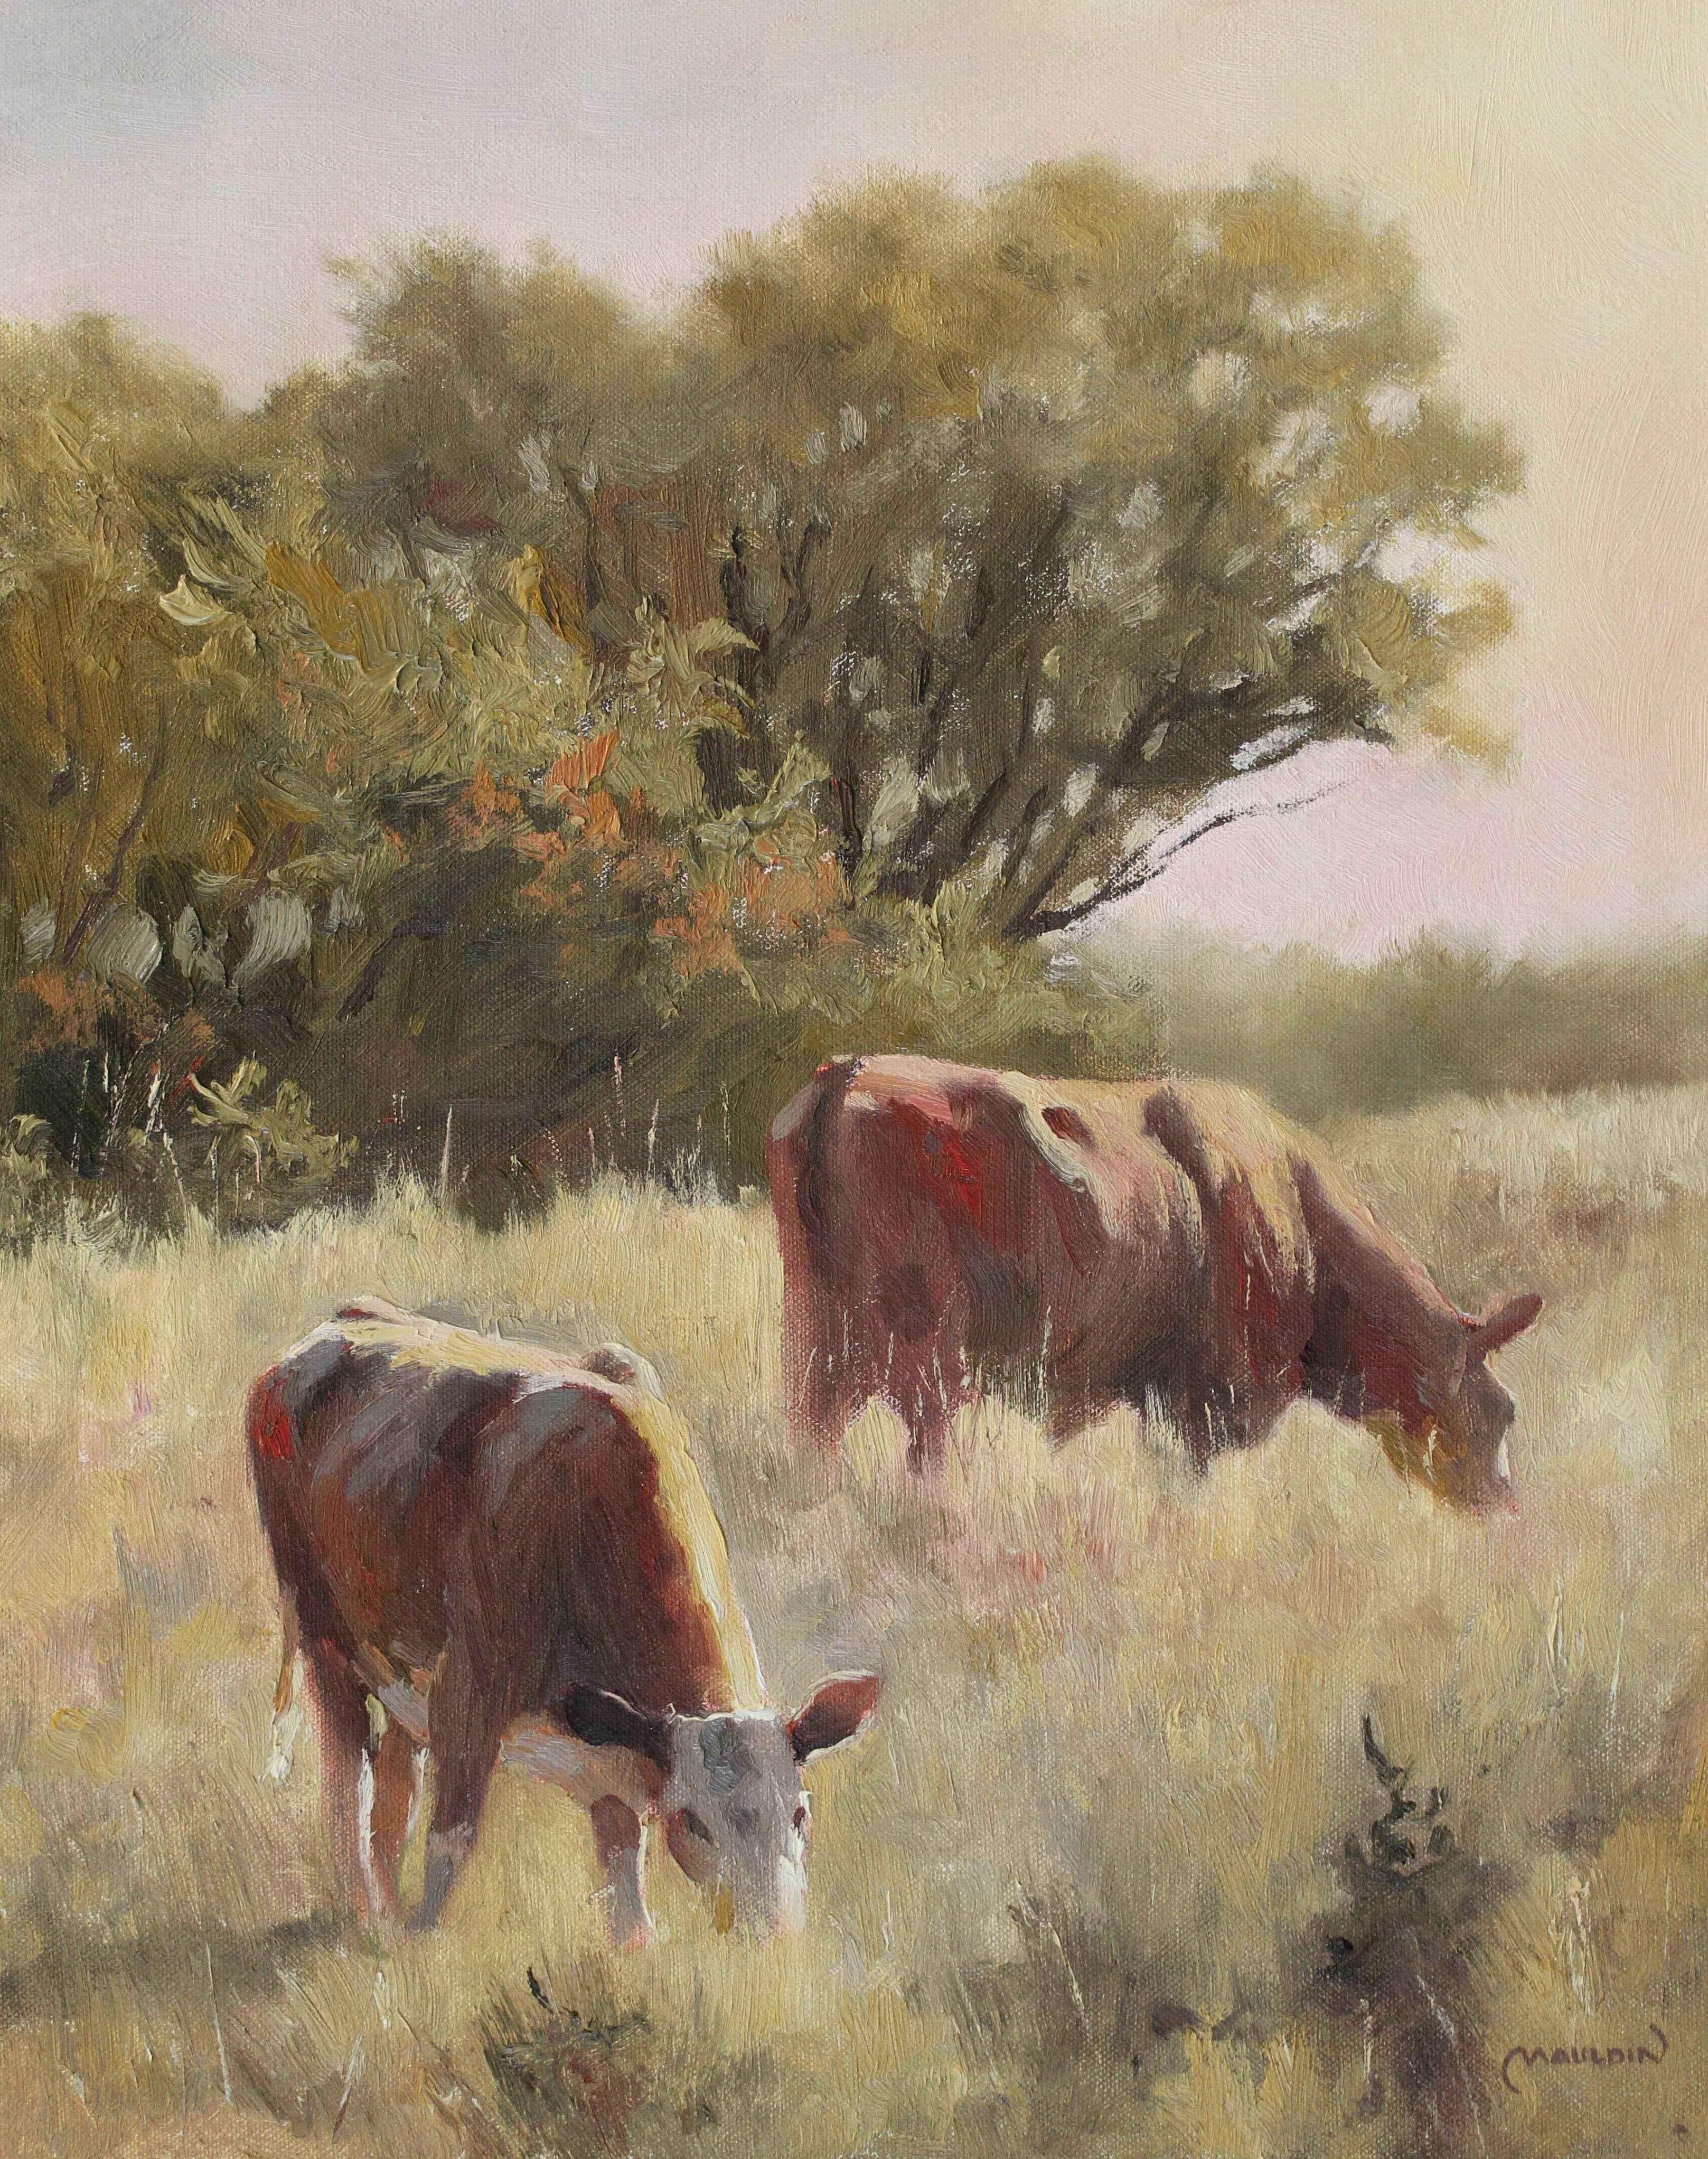 Grass Guzzlers by  Chuck Mauldin - Masterpiece Online